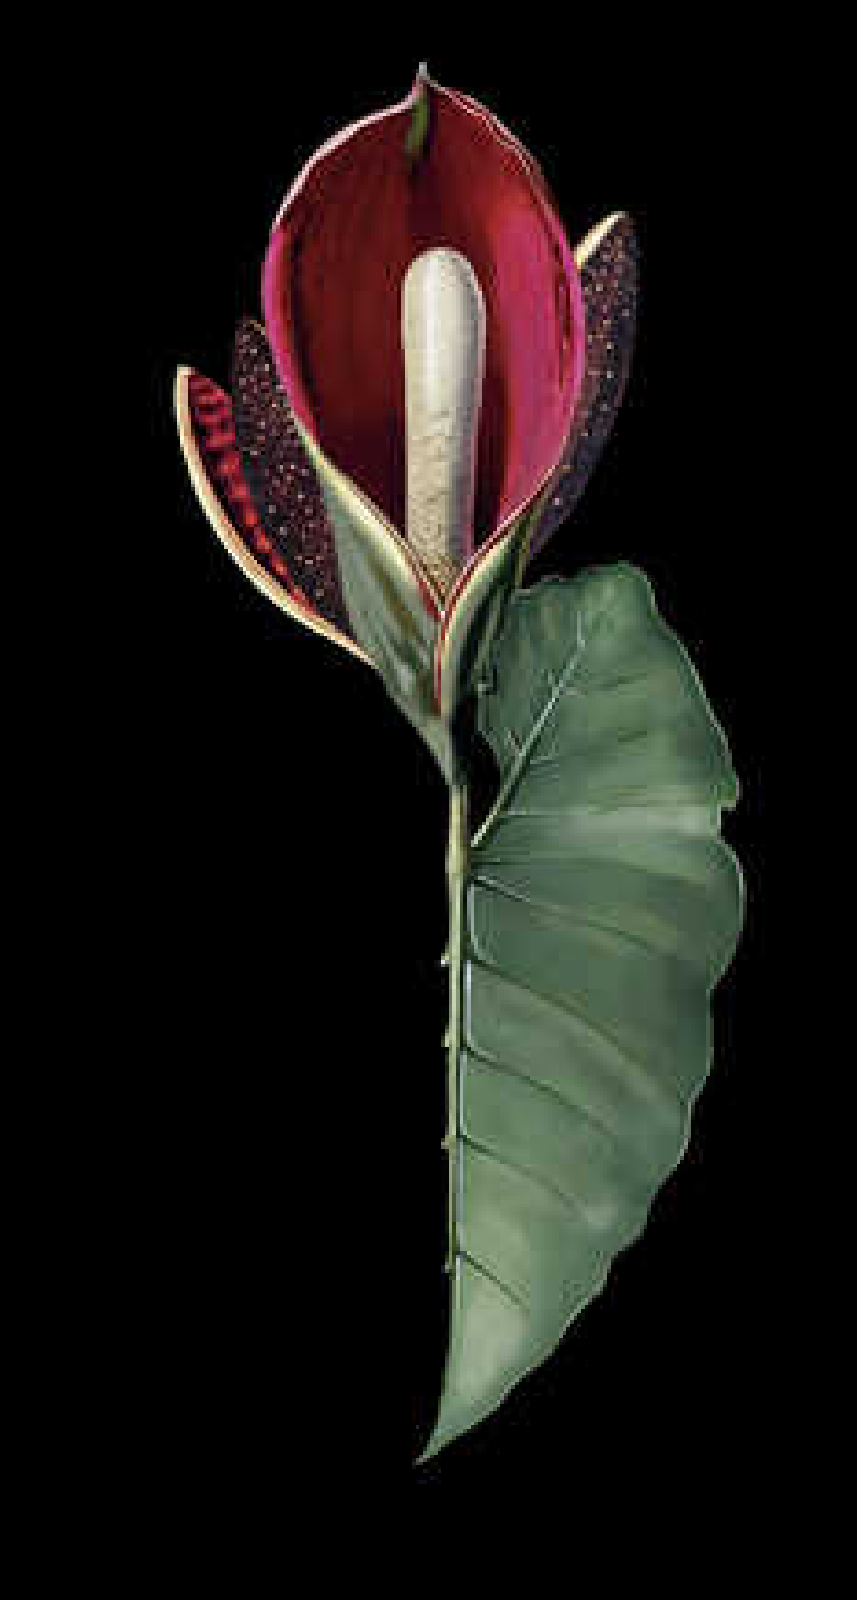 Rubidendron - Rive Roshan